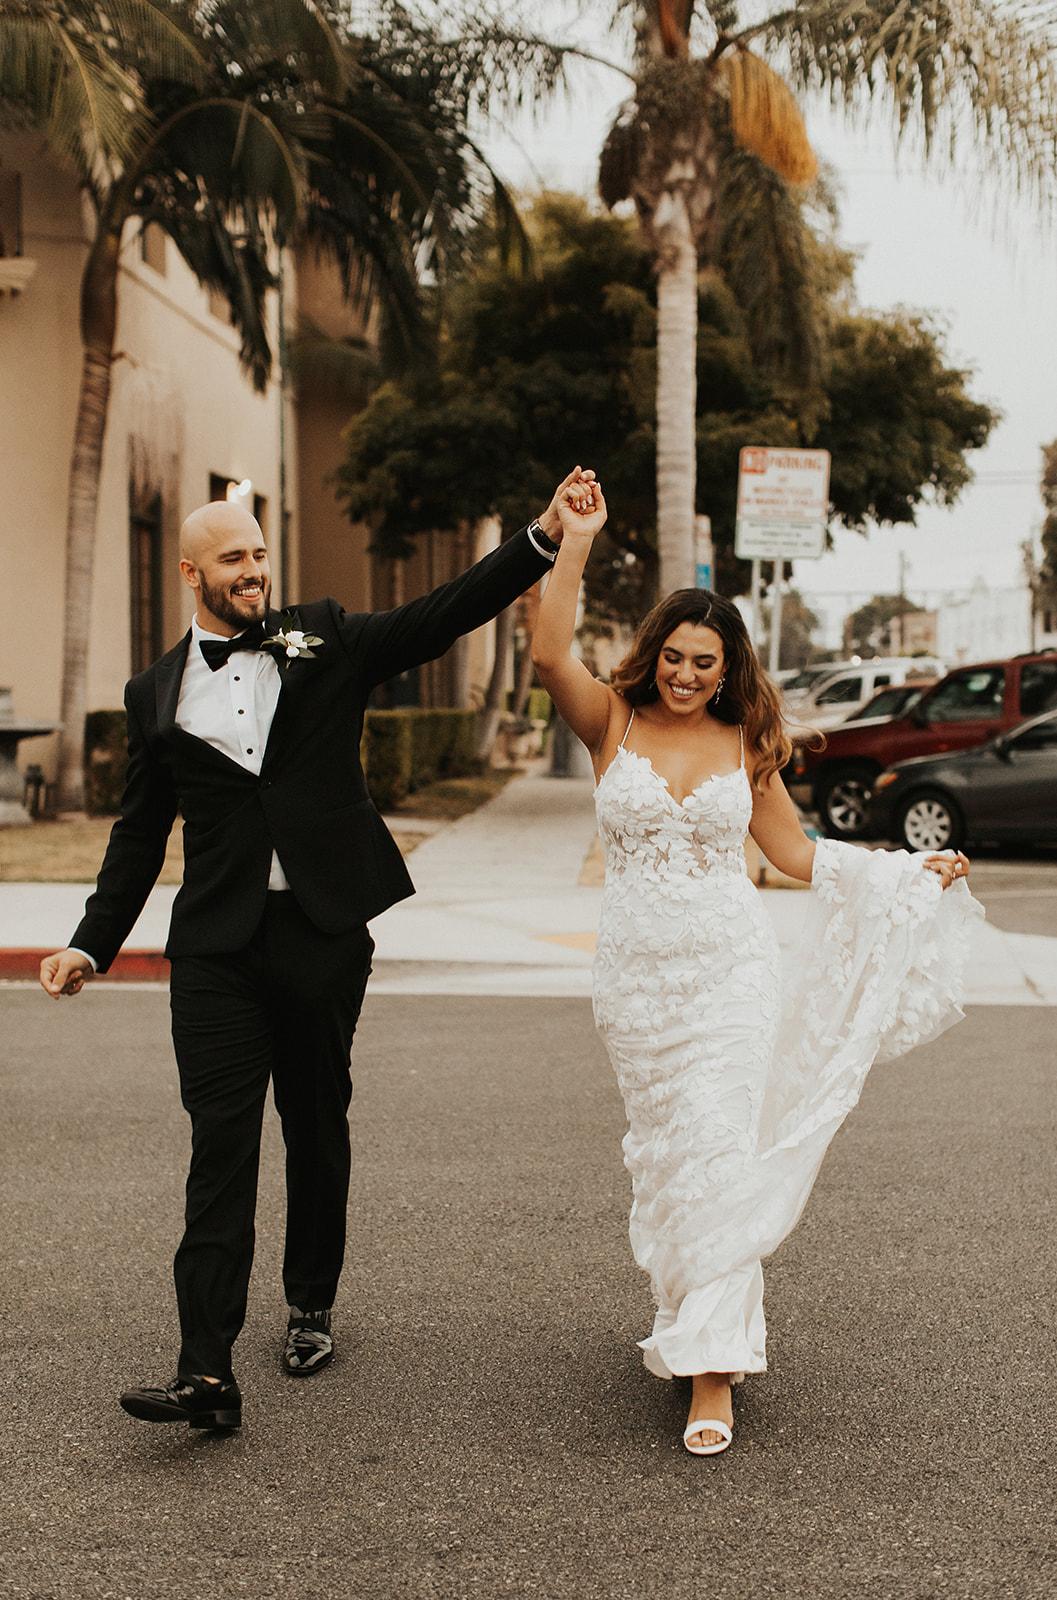 Bride and Groom dance in Los Angeles streets